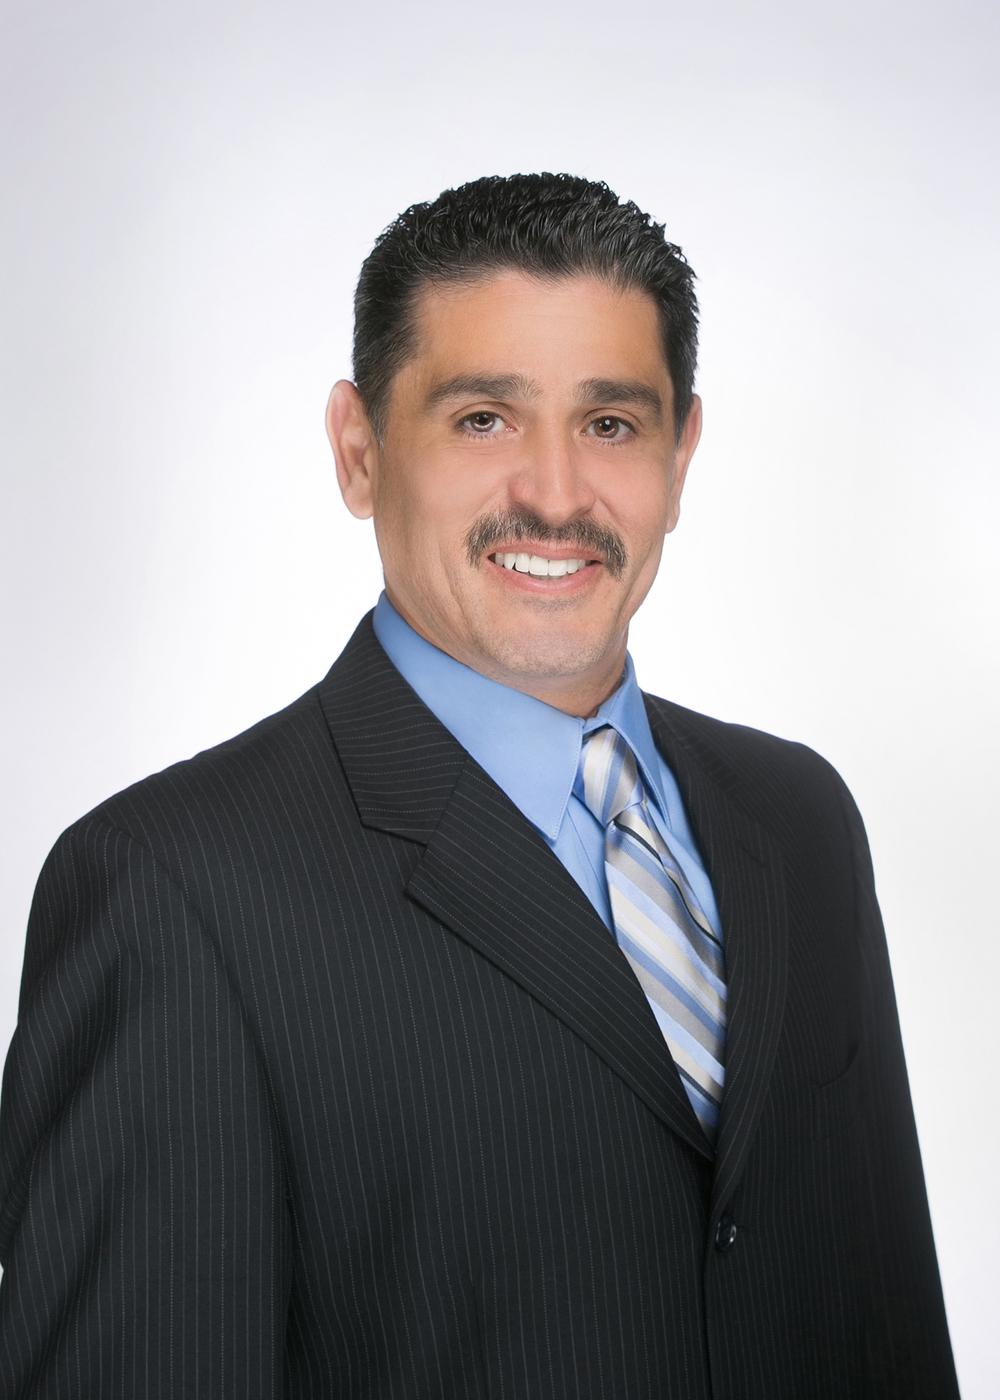 Raul Velazquez Senior Project Coordinator